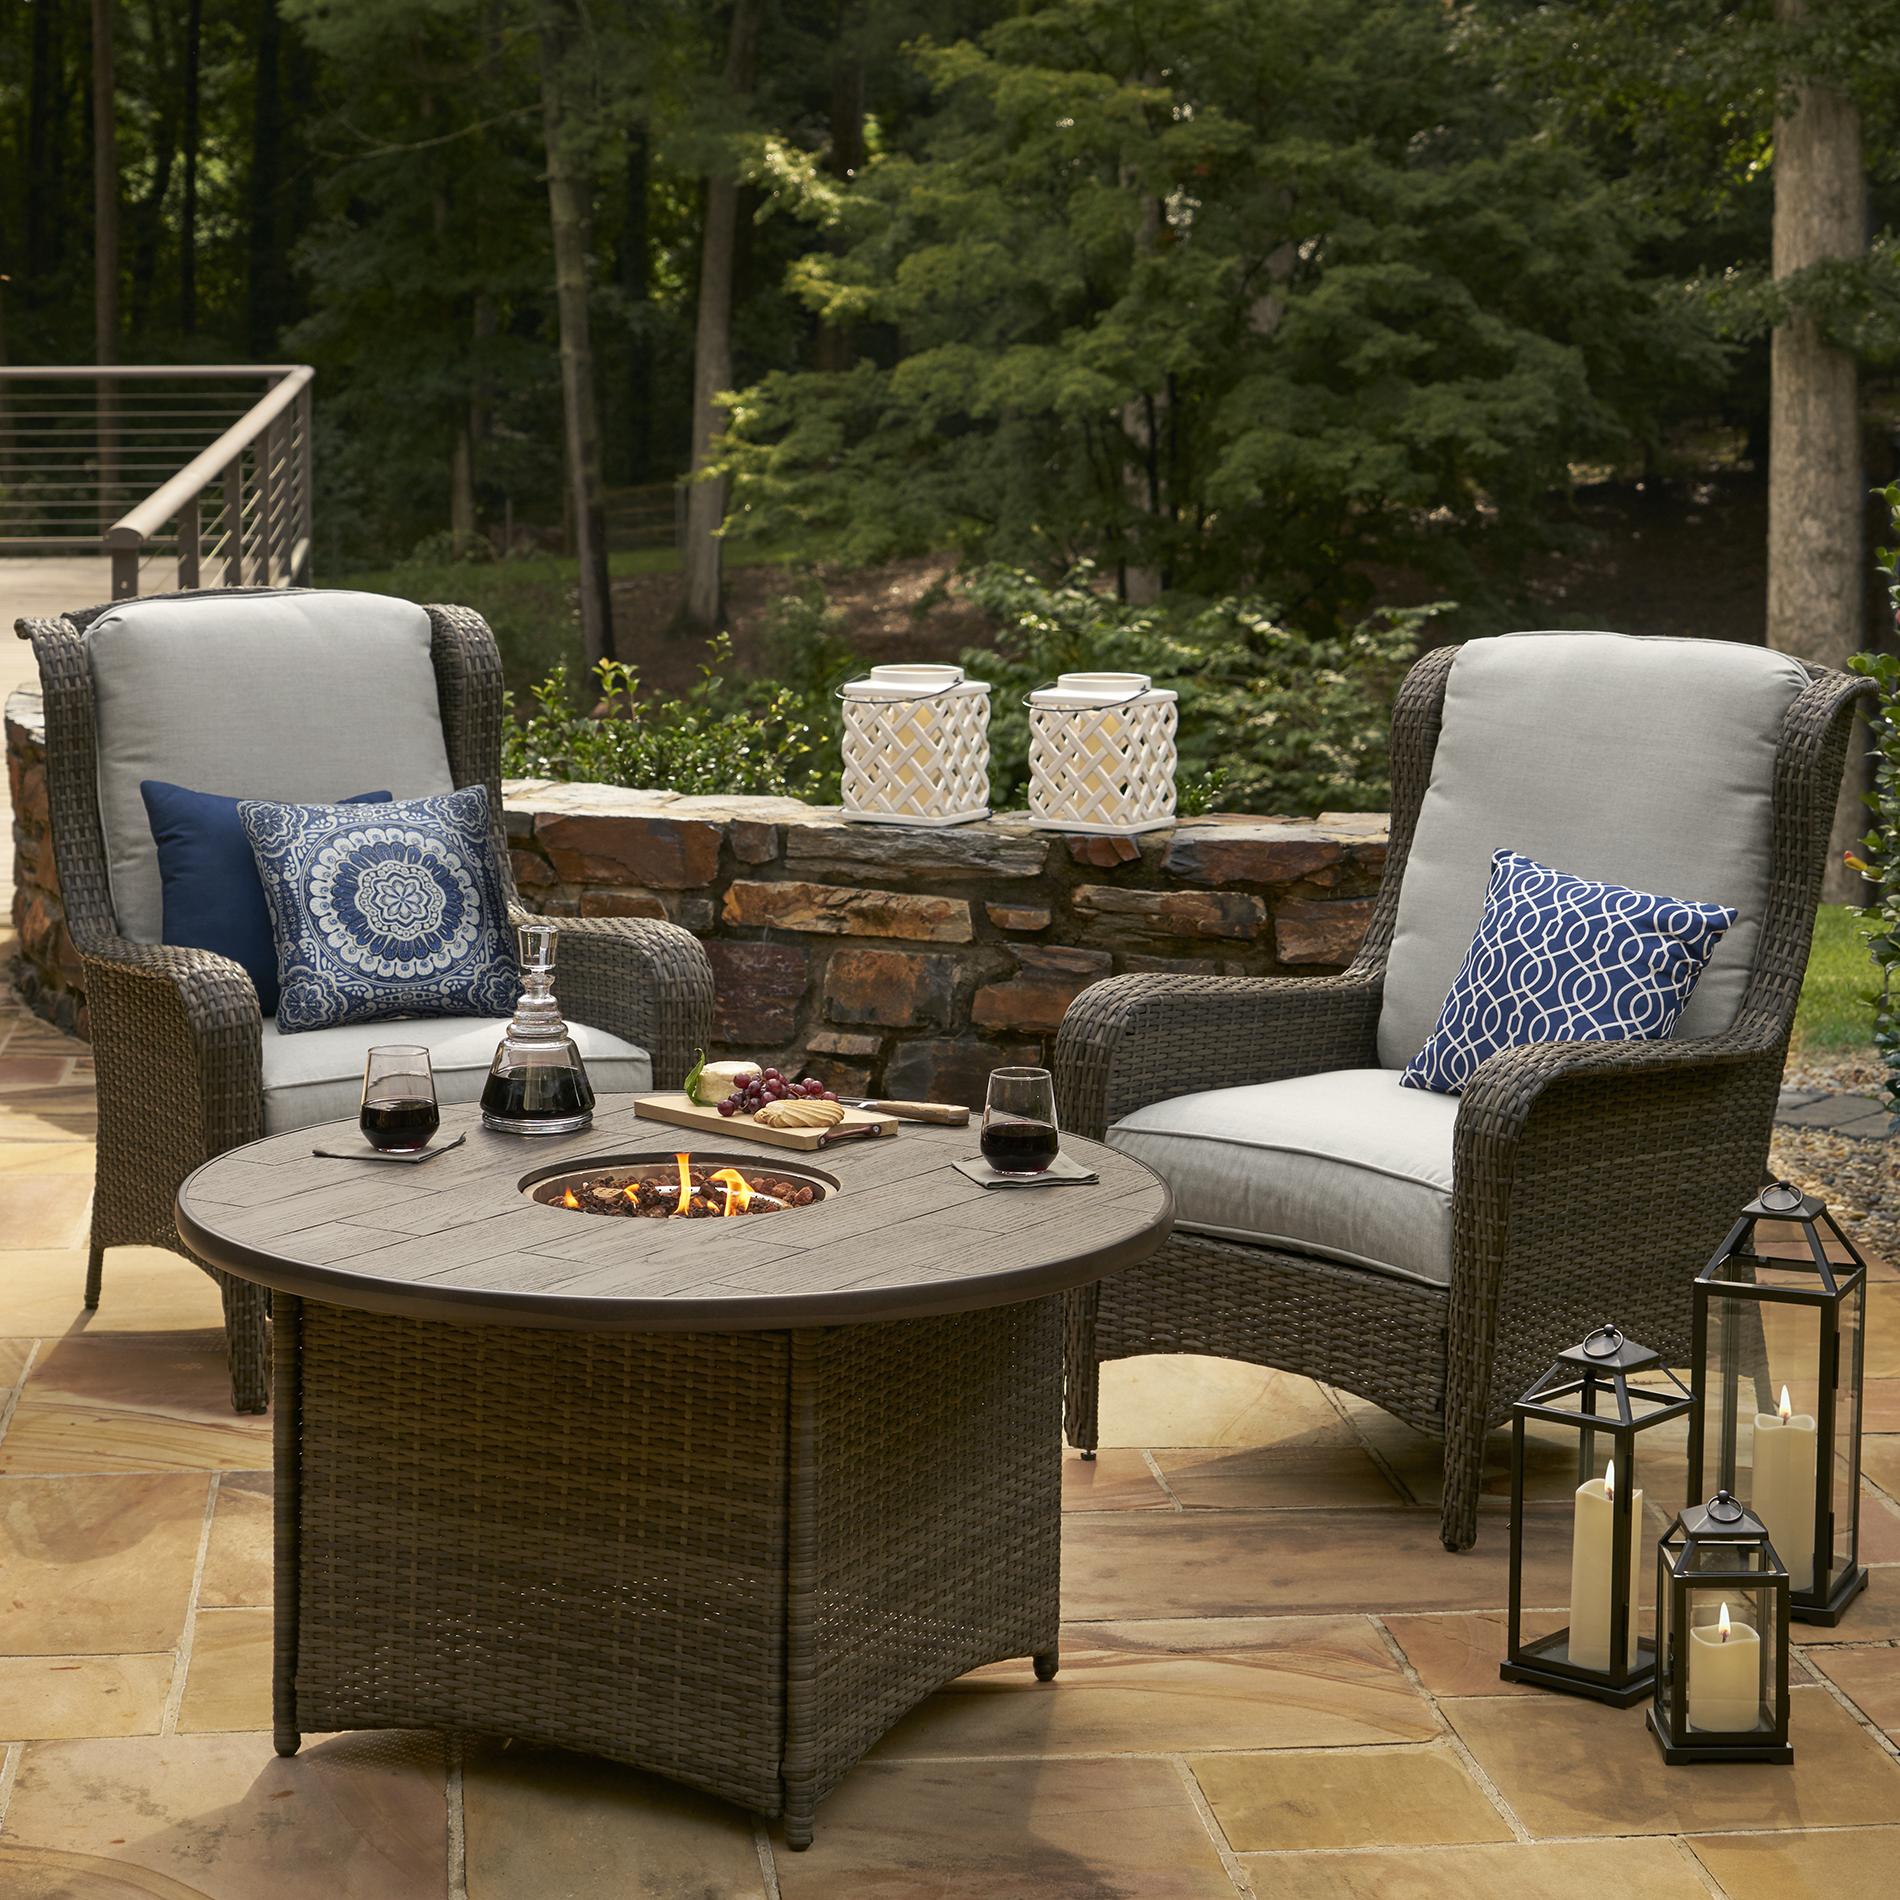 Grand Resort Monterey 2-piece Wicker Chair Set - Gray